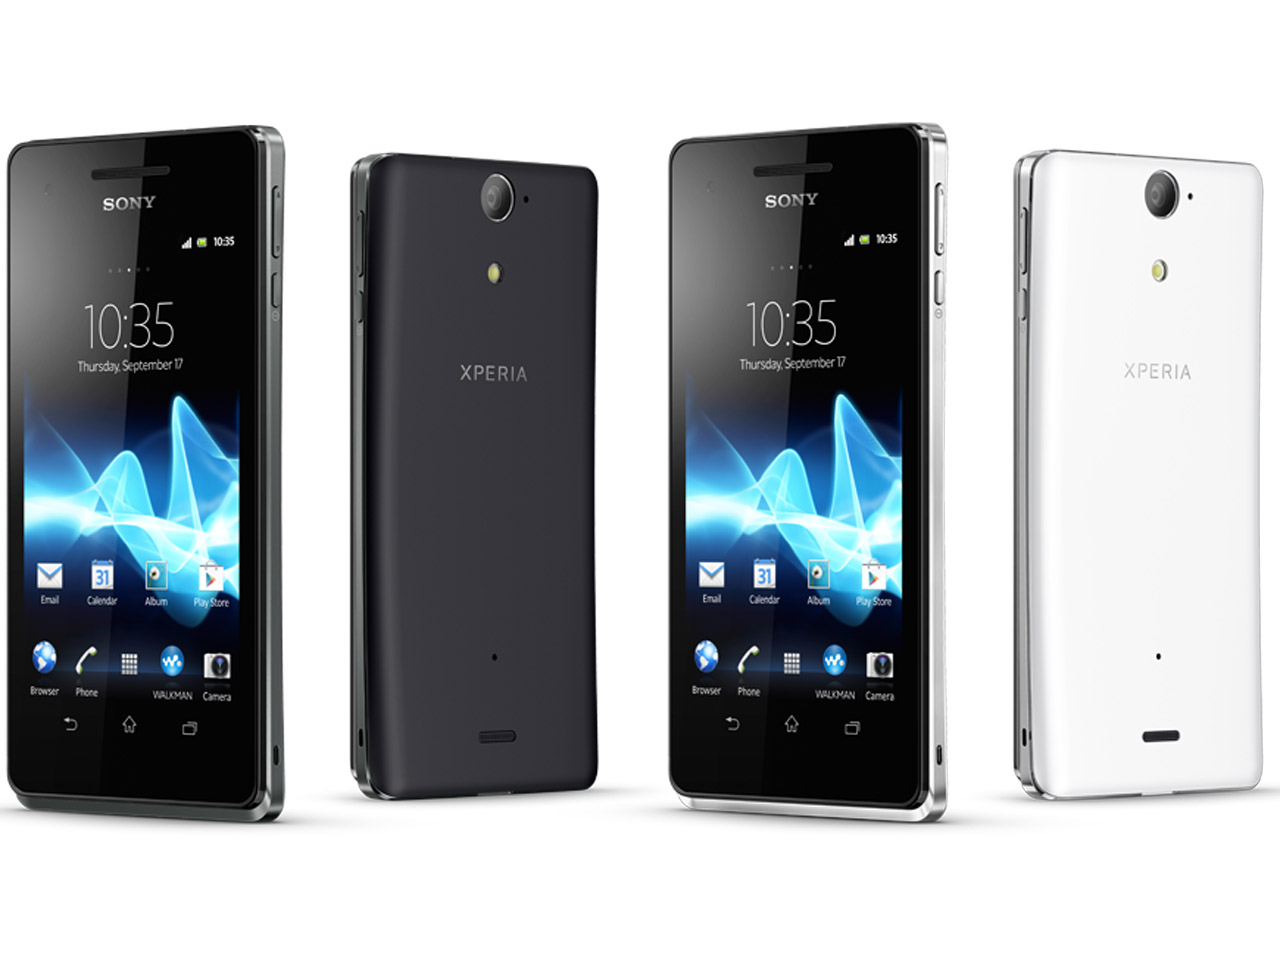 Android 4.3 dla Sony Xperia T i Xperia V już wkrótce?